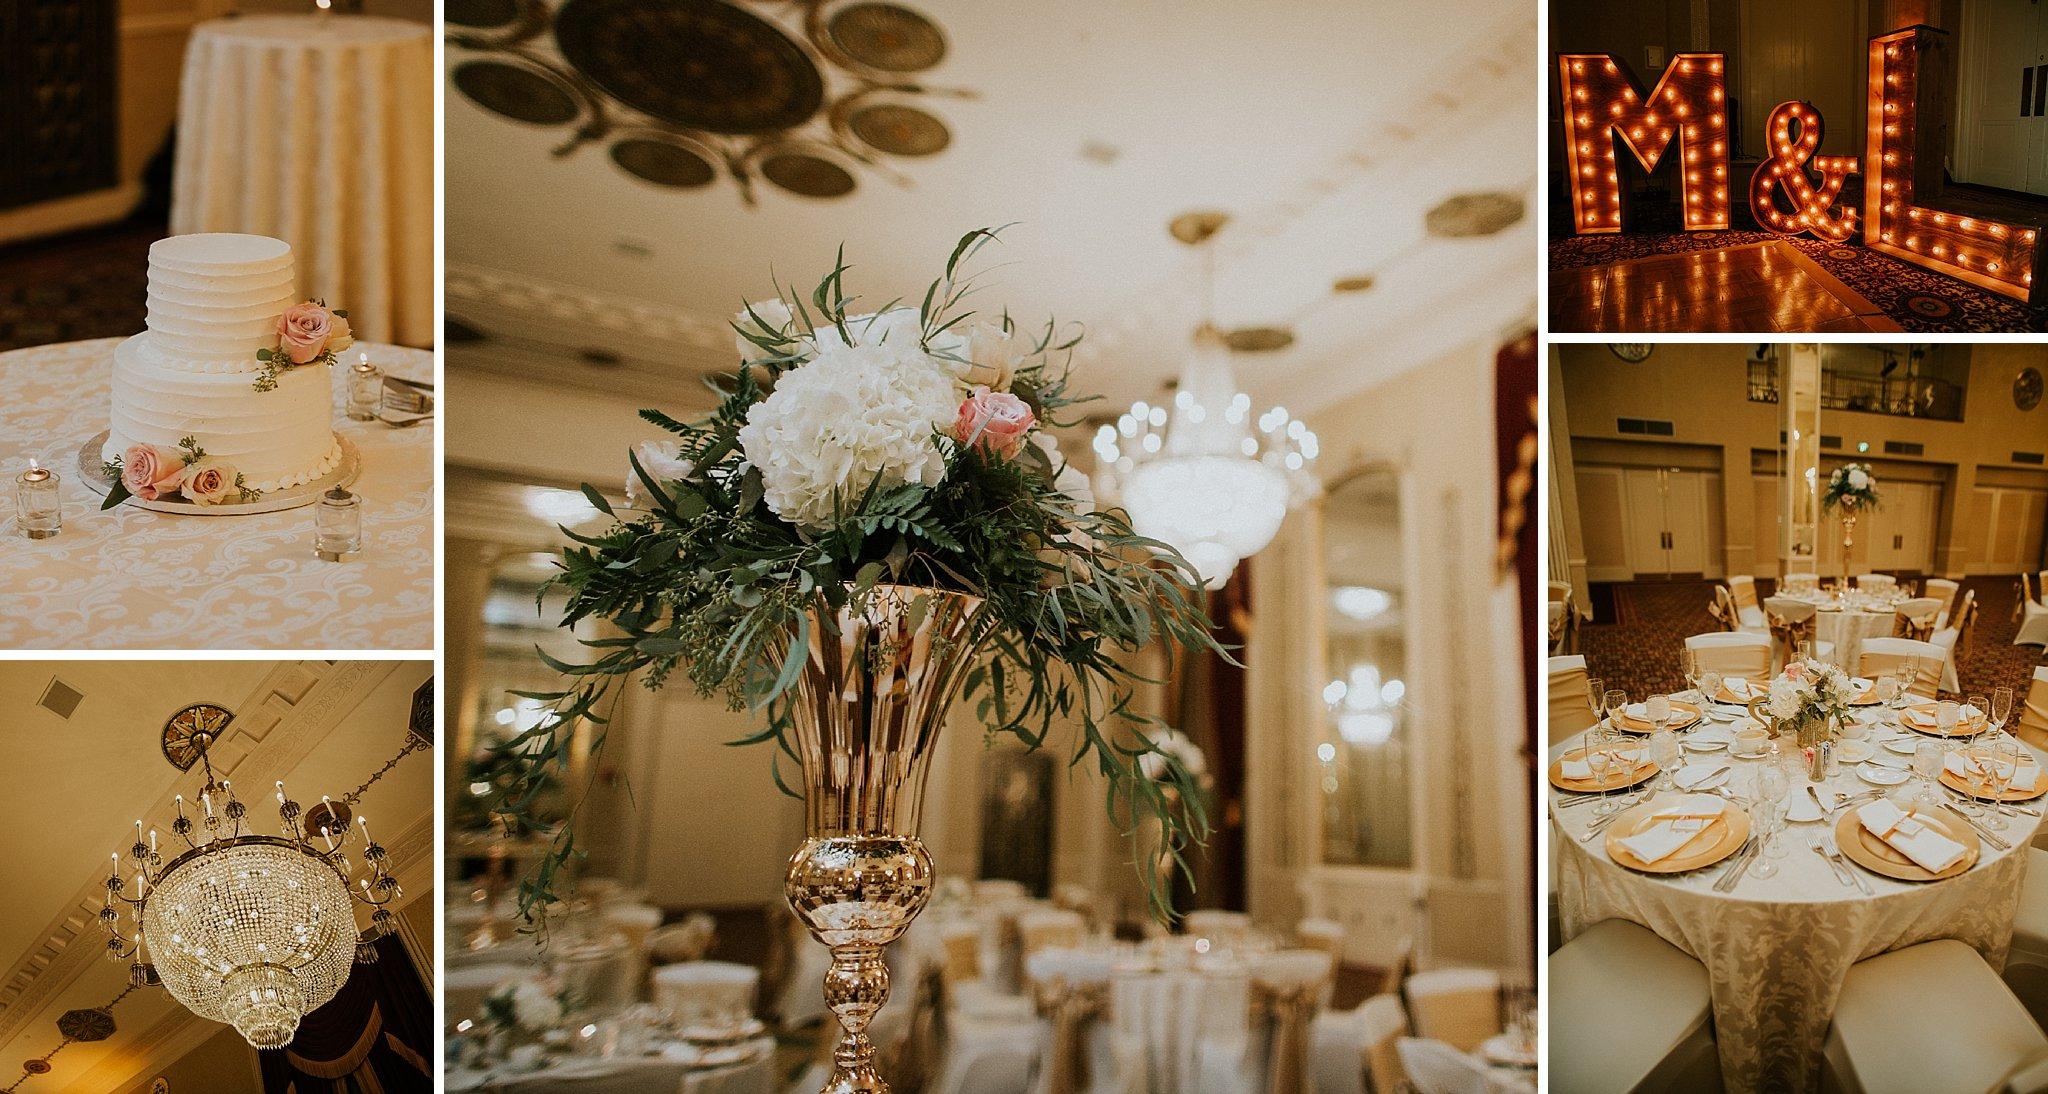 Matt-Lauren_St-Marys_Hilton-City-Center-Milwaukee-Wedding_liller-photo_0064.jpg